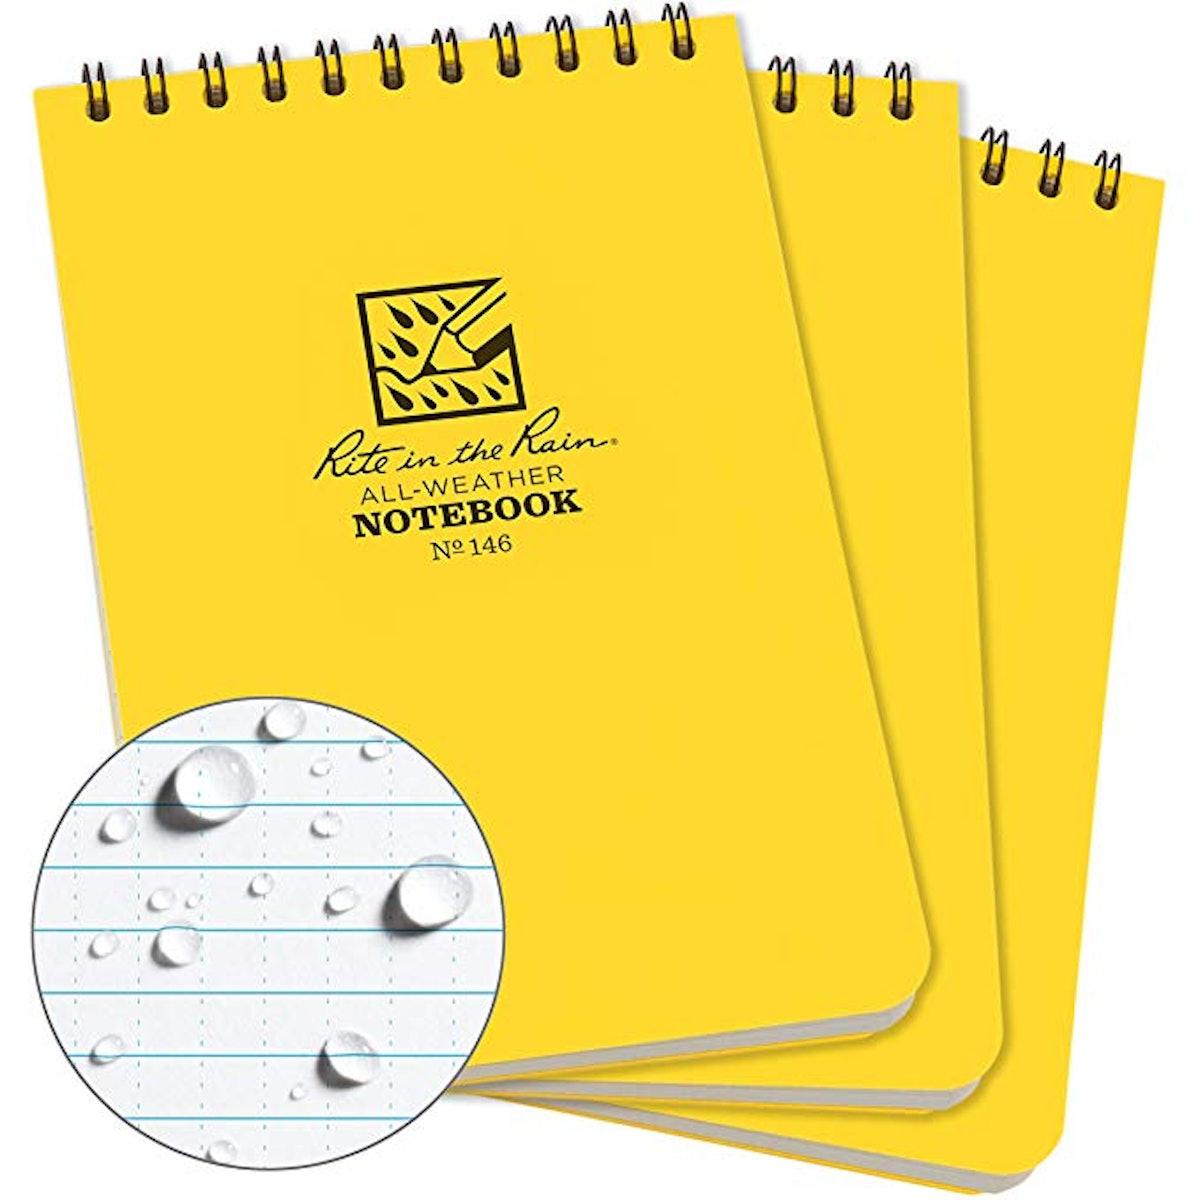 Rite in the Rain Weatherproof Top Spiral Notepad (3-Pack)